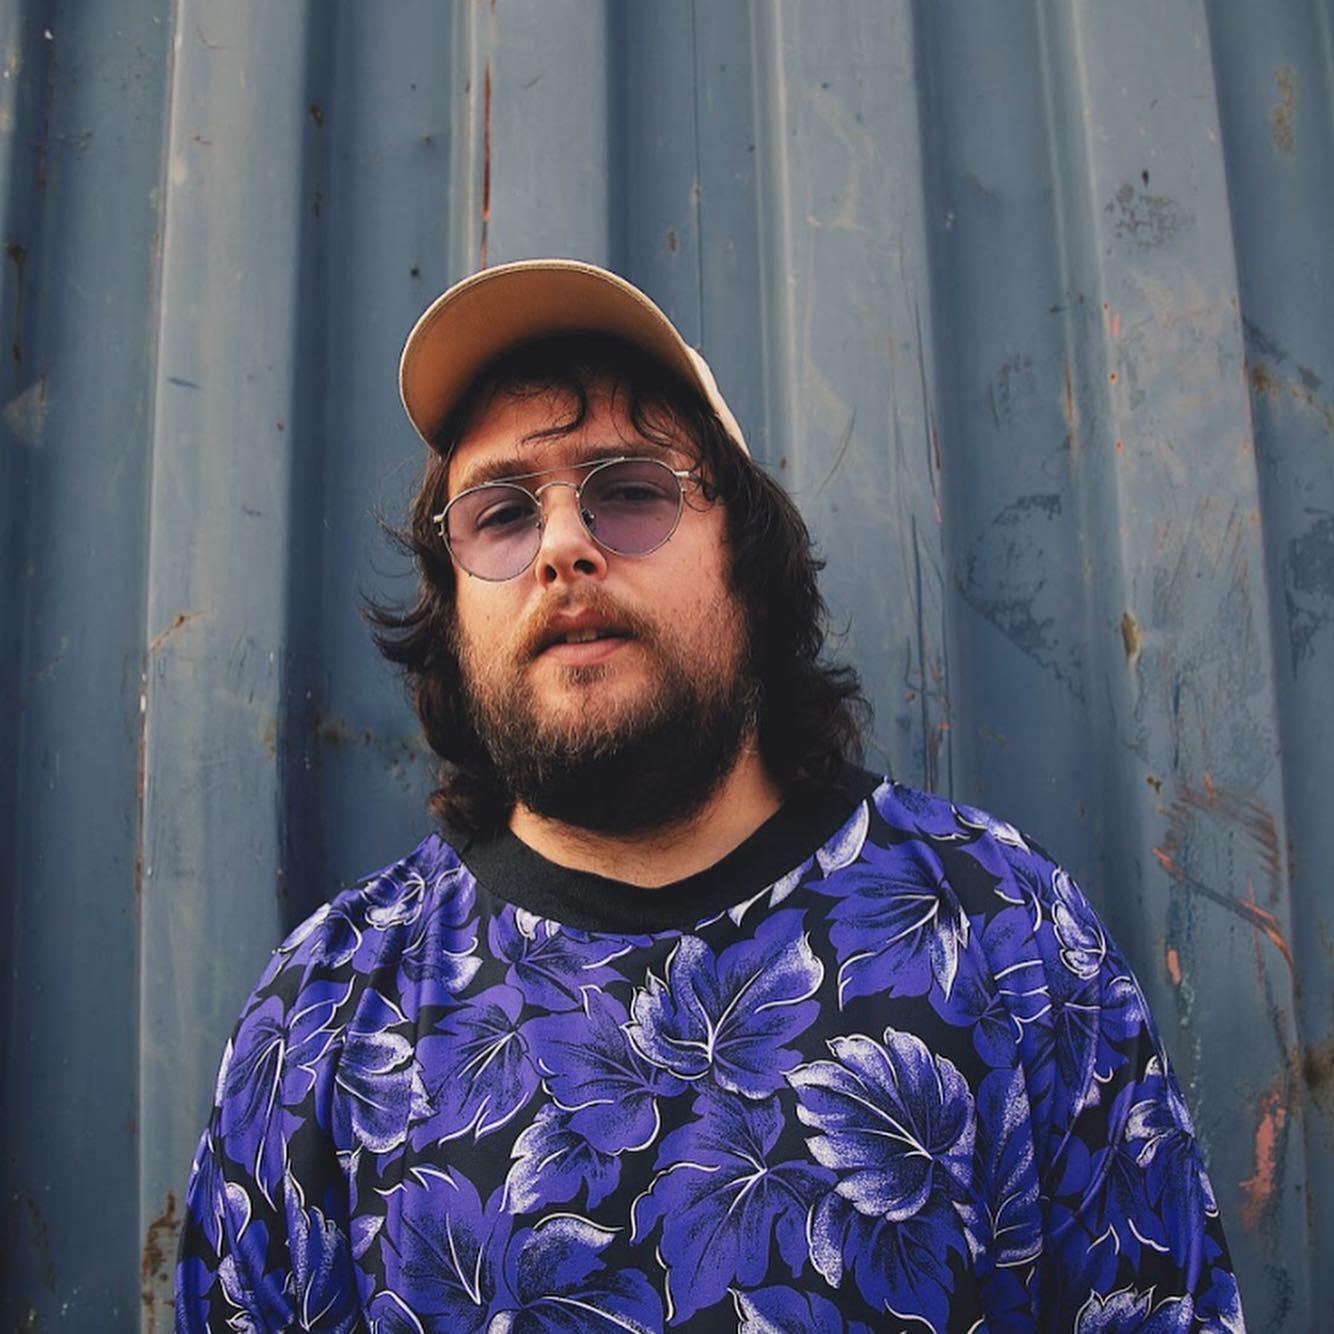 Jake Ames recording new Knife Channel album at Driftwork Sound Austin